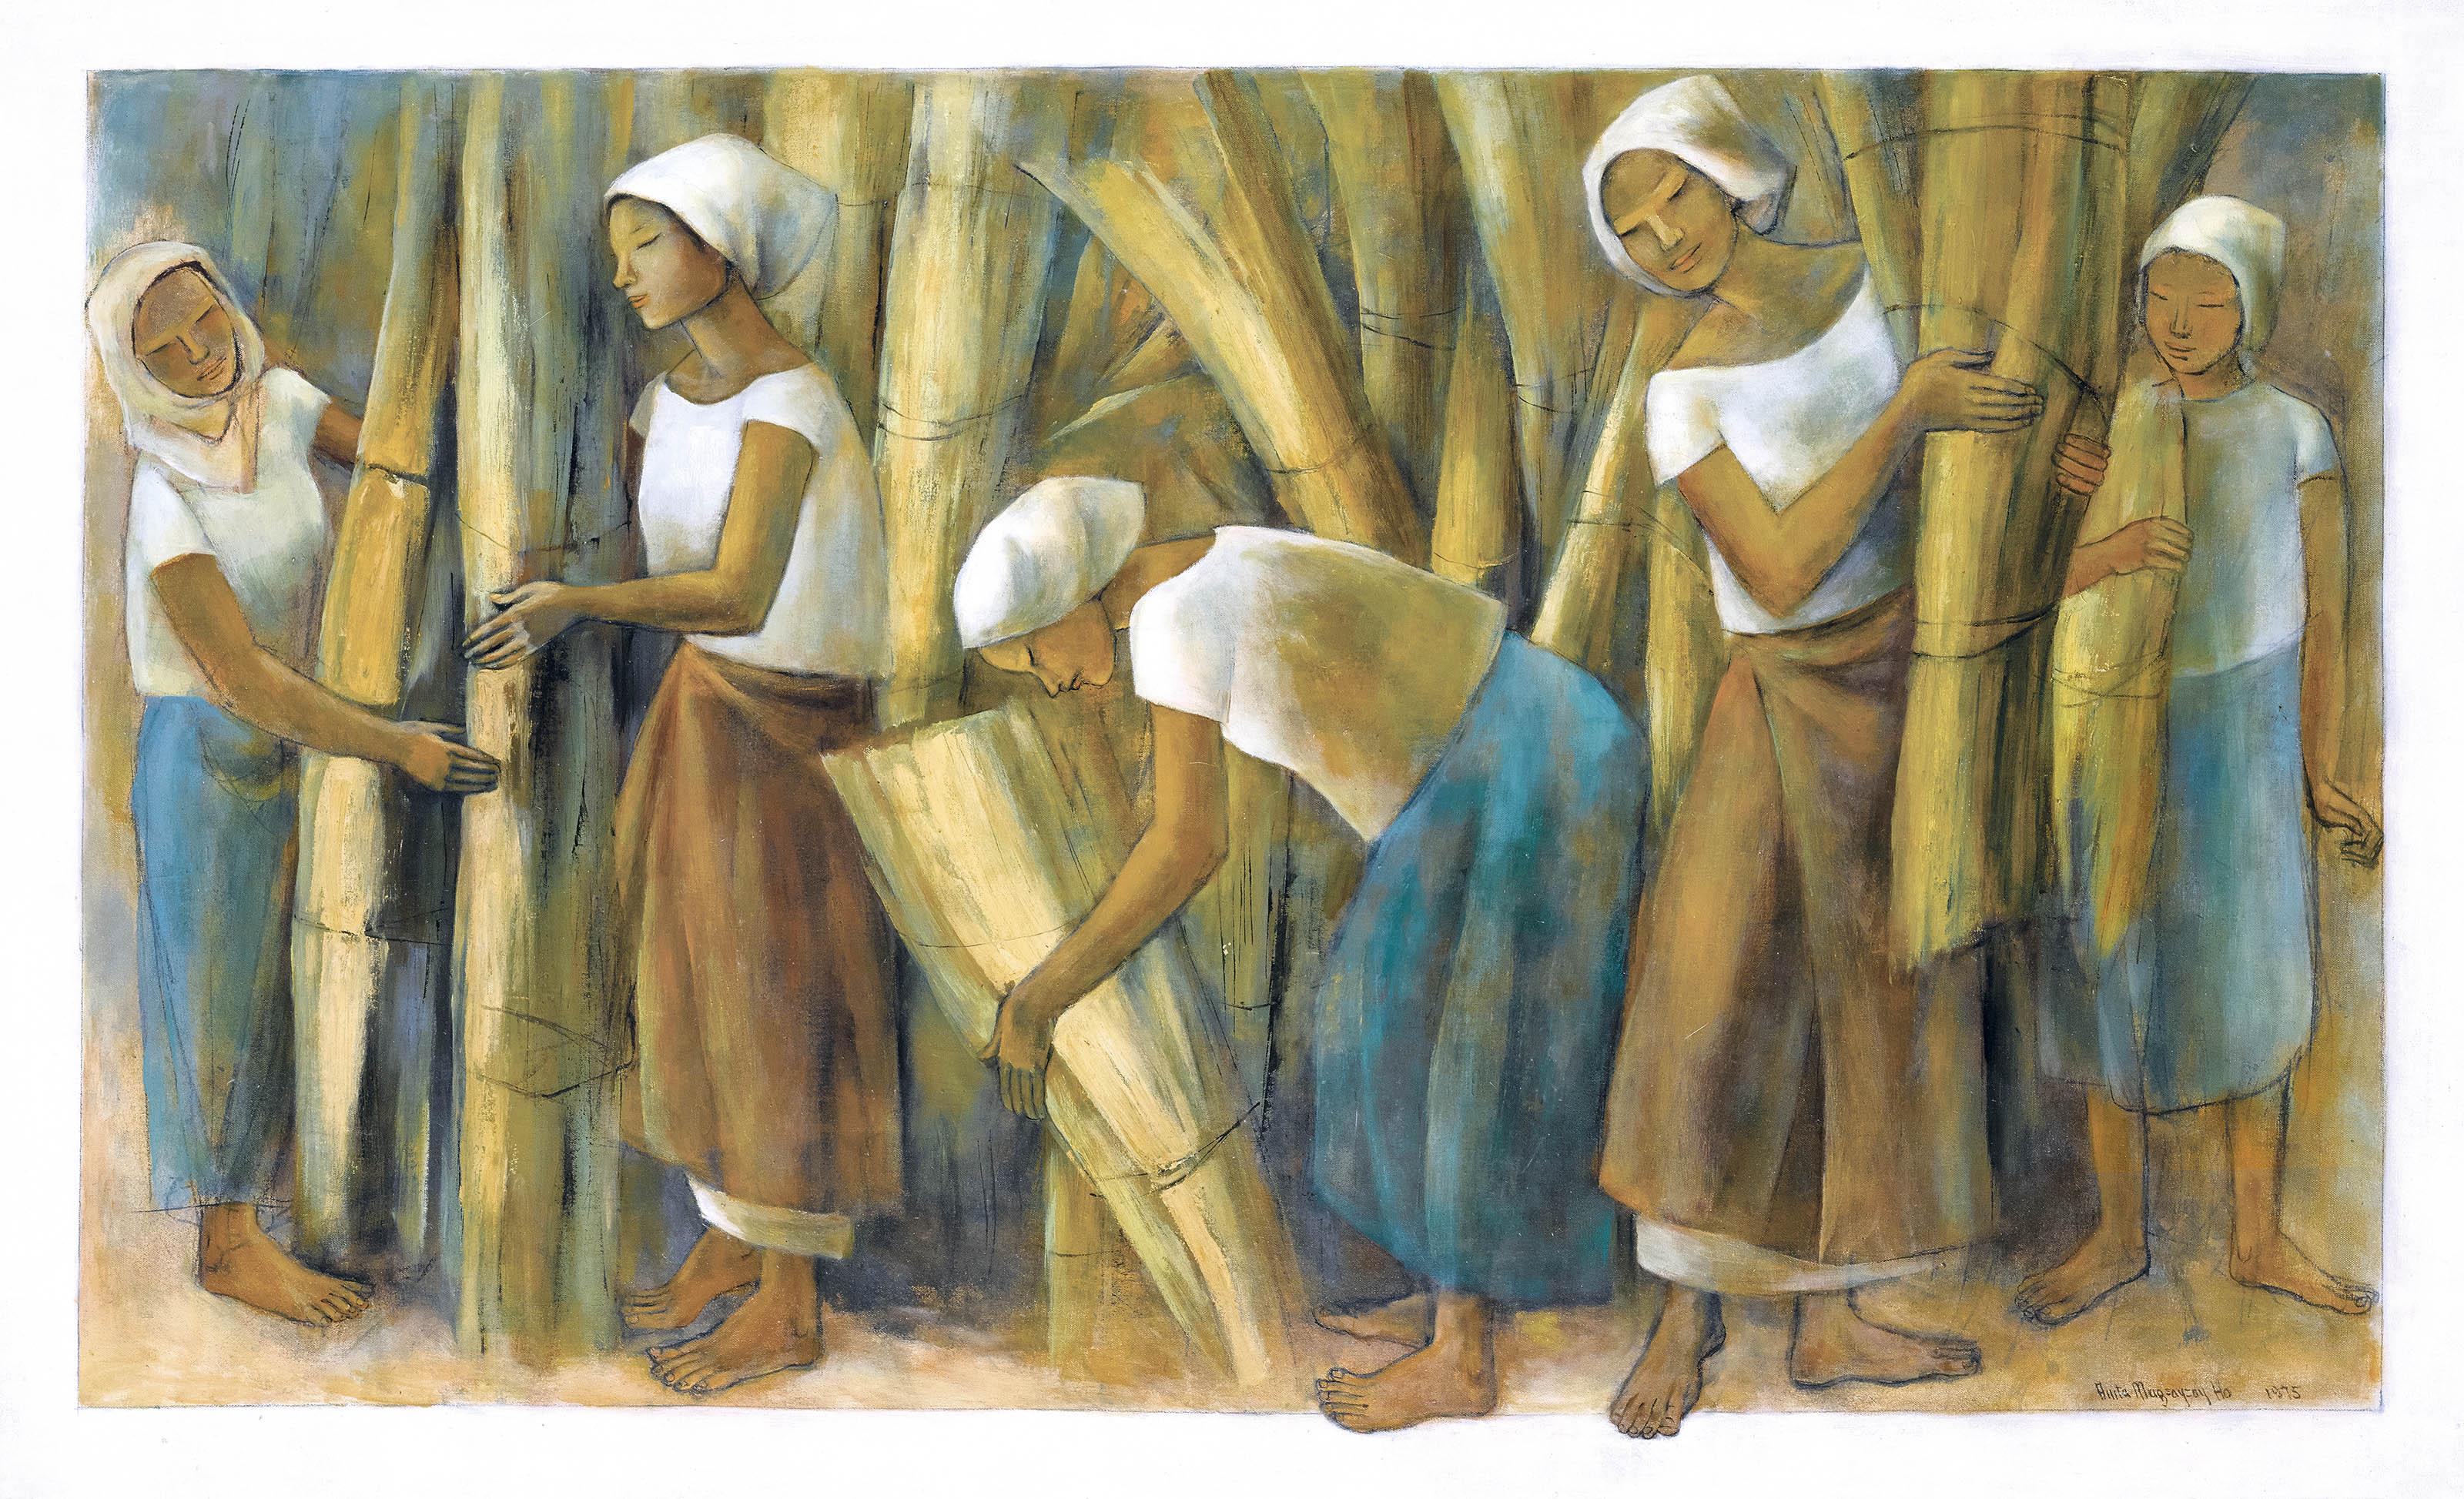 ANITA MAGSAYSAY-HO (PHILIPPINES, 1914-2012)